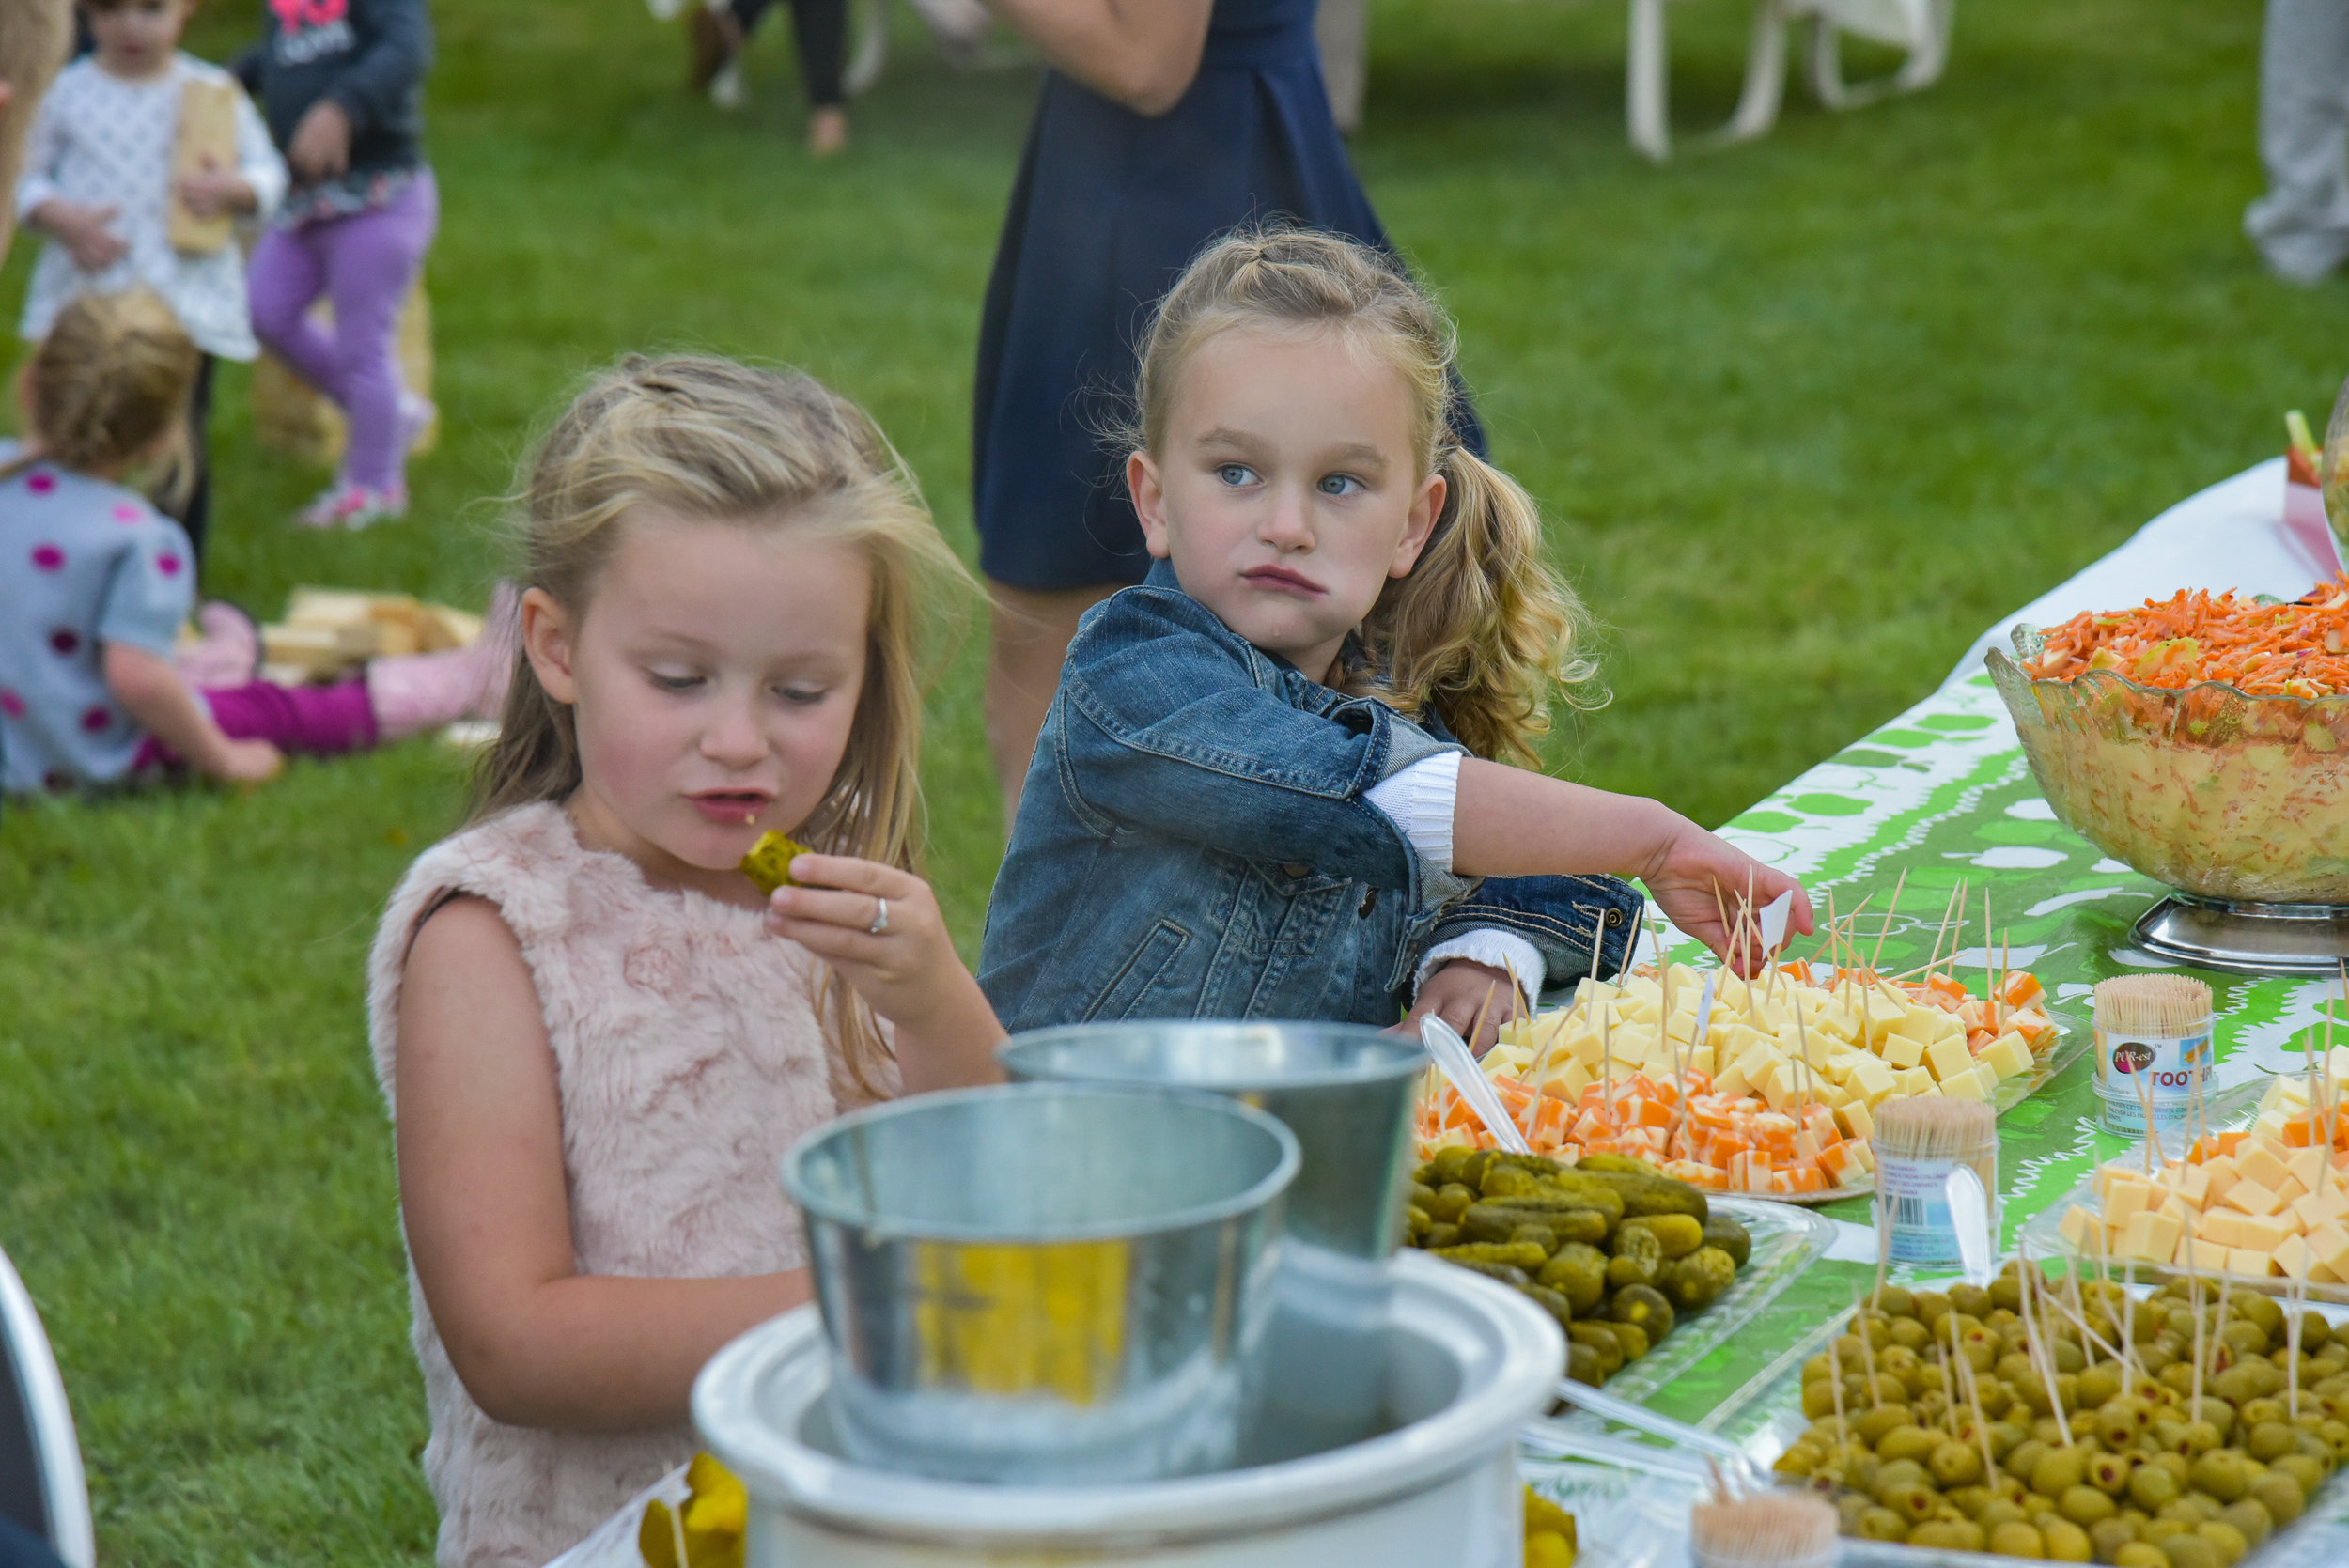 Banfield-Walcott Wedding - 24 SEP 2016 - 047 - Let's Eat.JPG